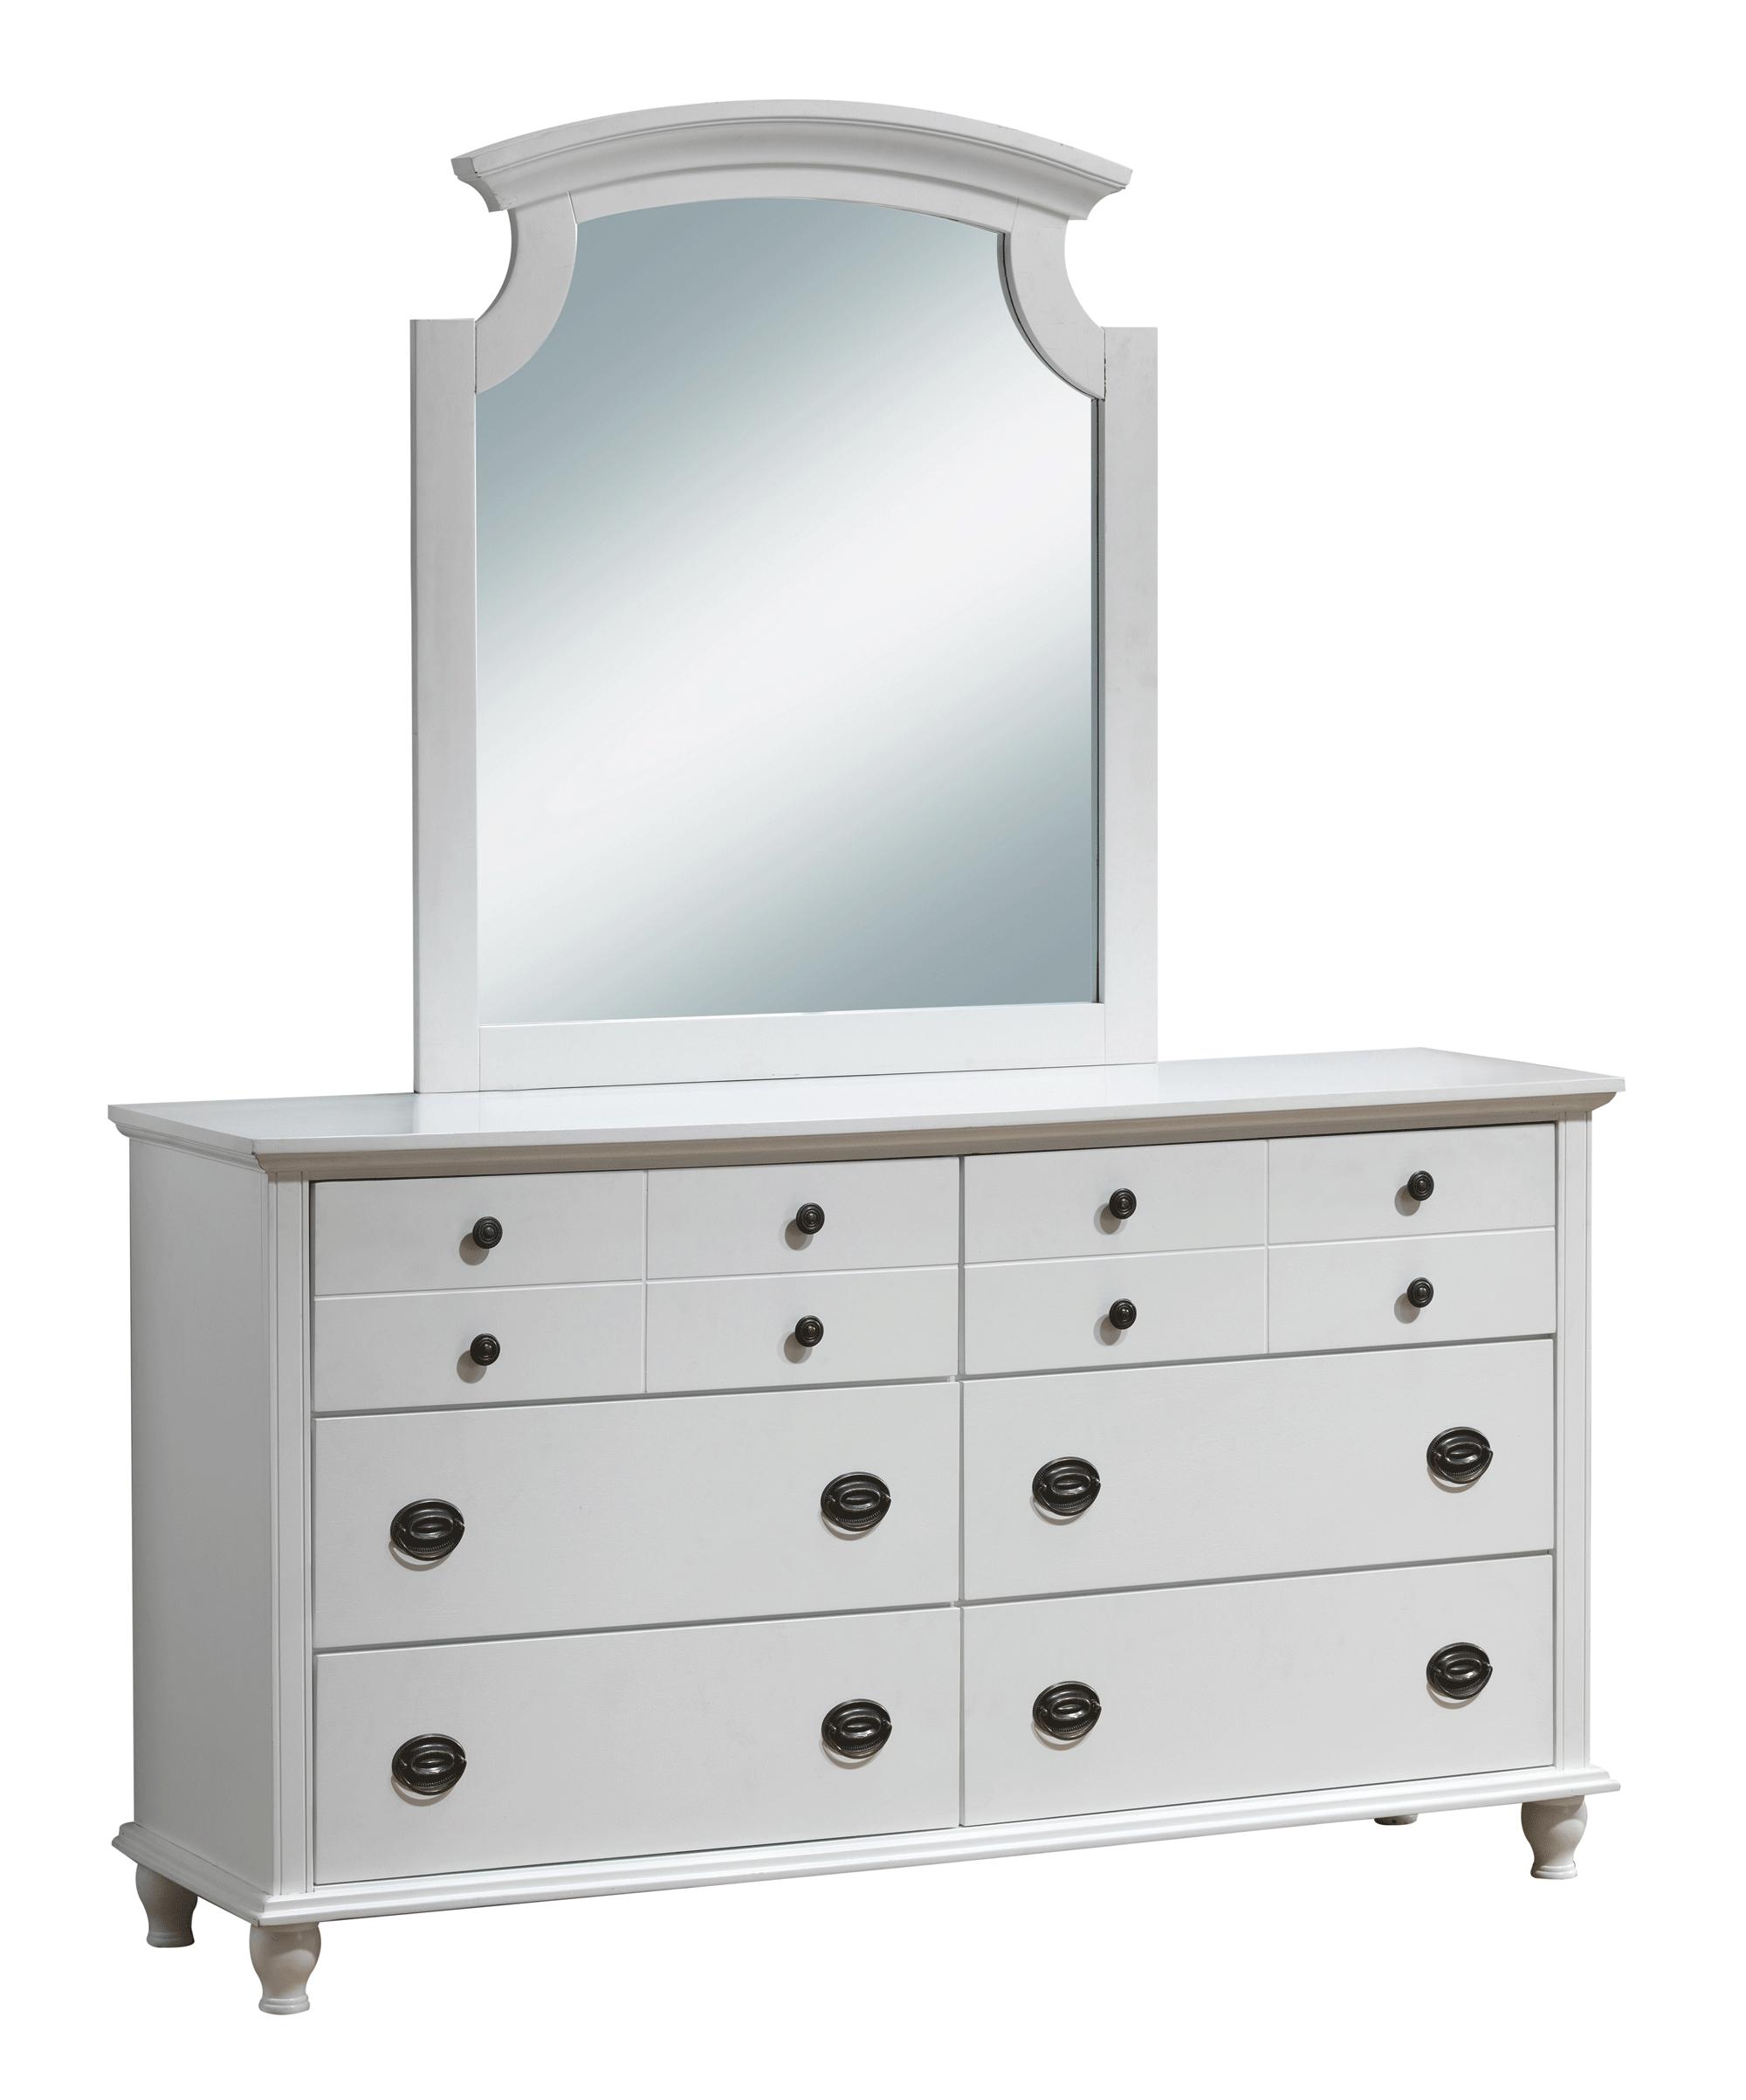 Leila Kids White Dresser By Global Furniture